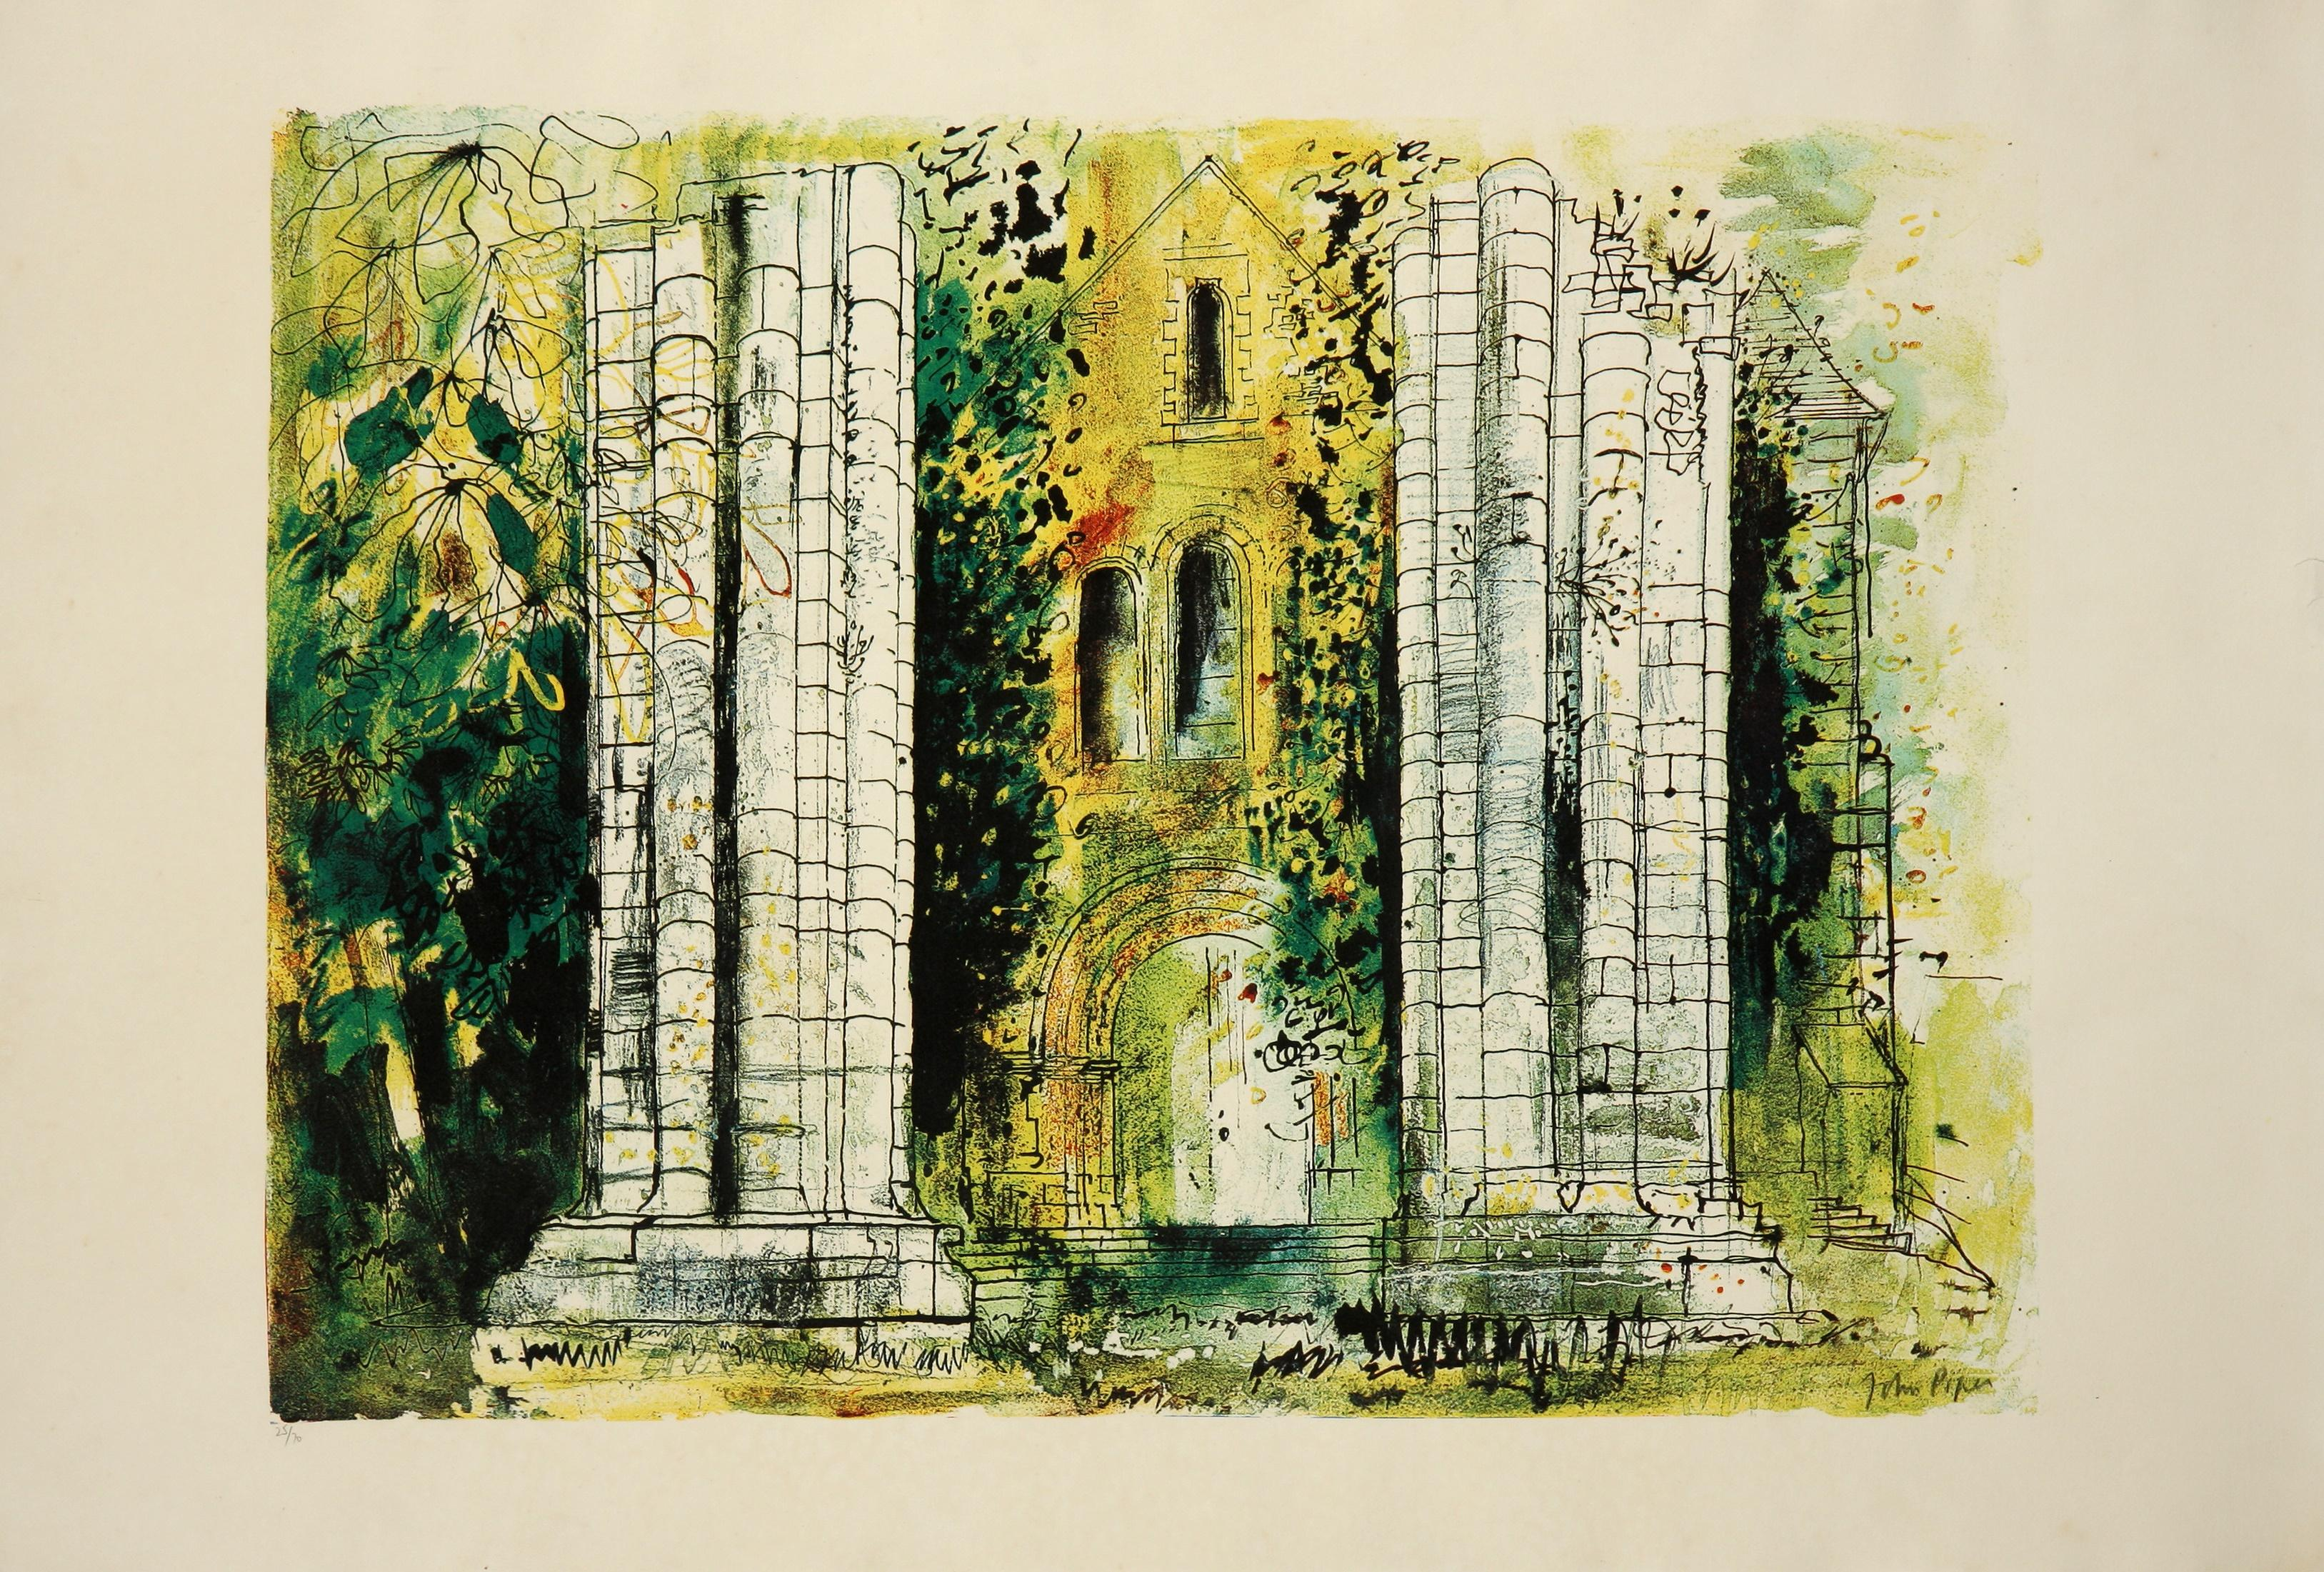 John Piper (United Kingdom 1903-1992) St Raphael, Dordogne, 1968